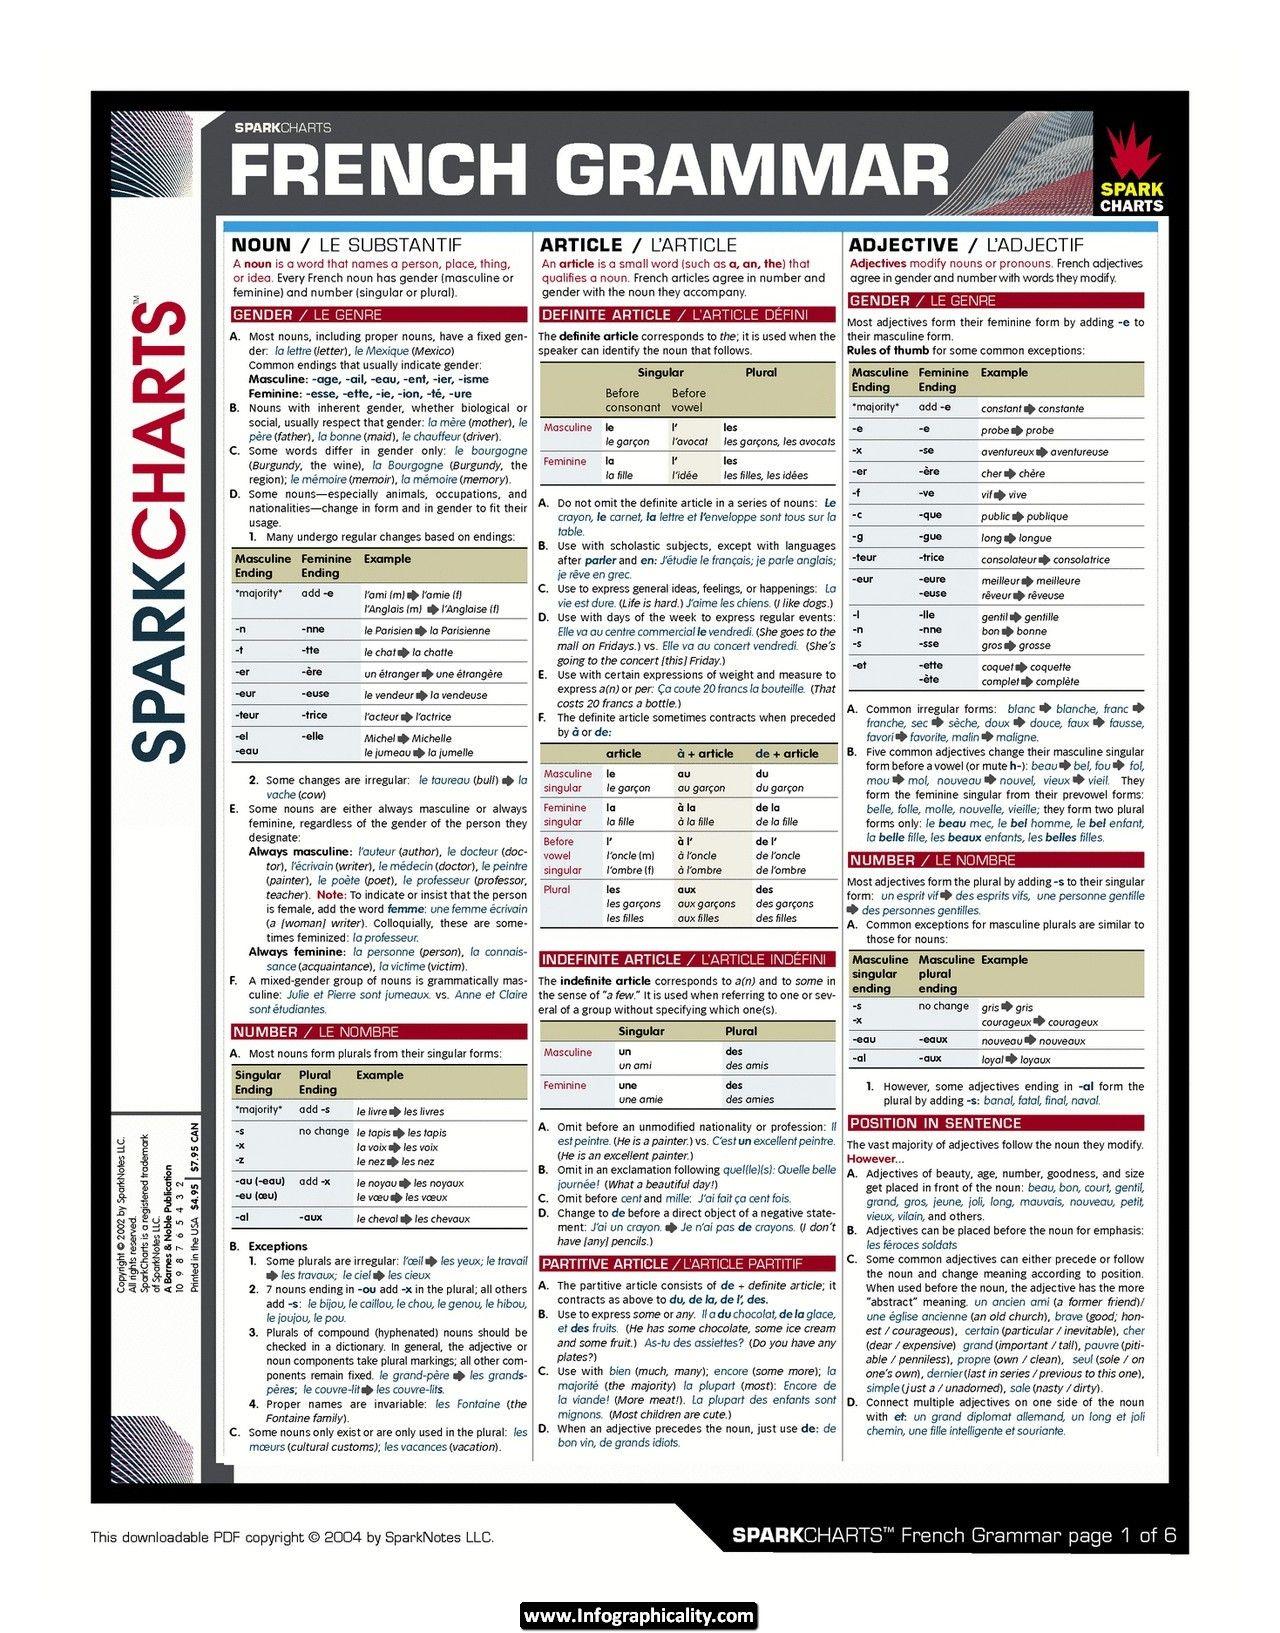 French Grammar Cheat Sheet